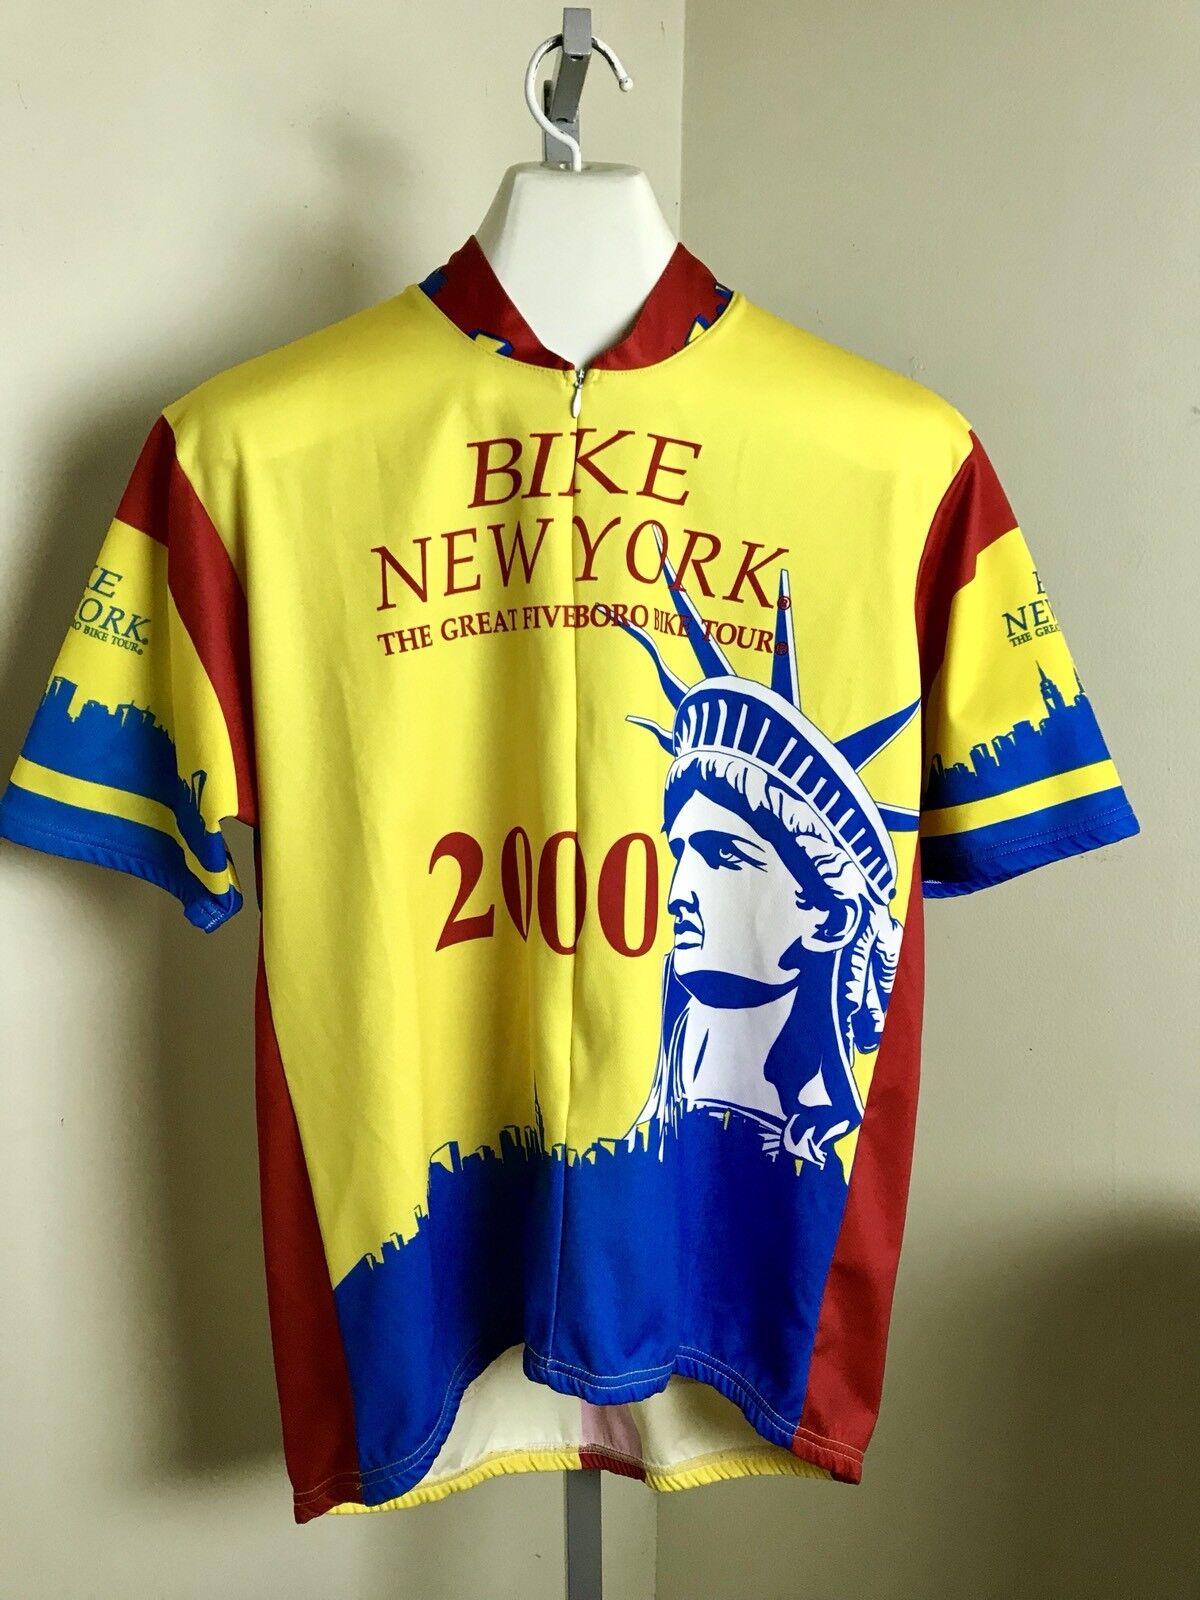 2000 Bike New York Cycling Jersey Shirt Men's 1 4  Zip 2XL Pace Statue Of Liberty  lowest whole network